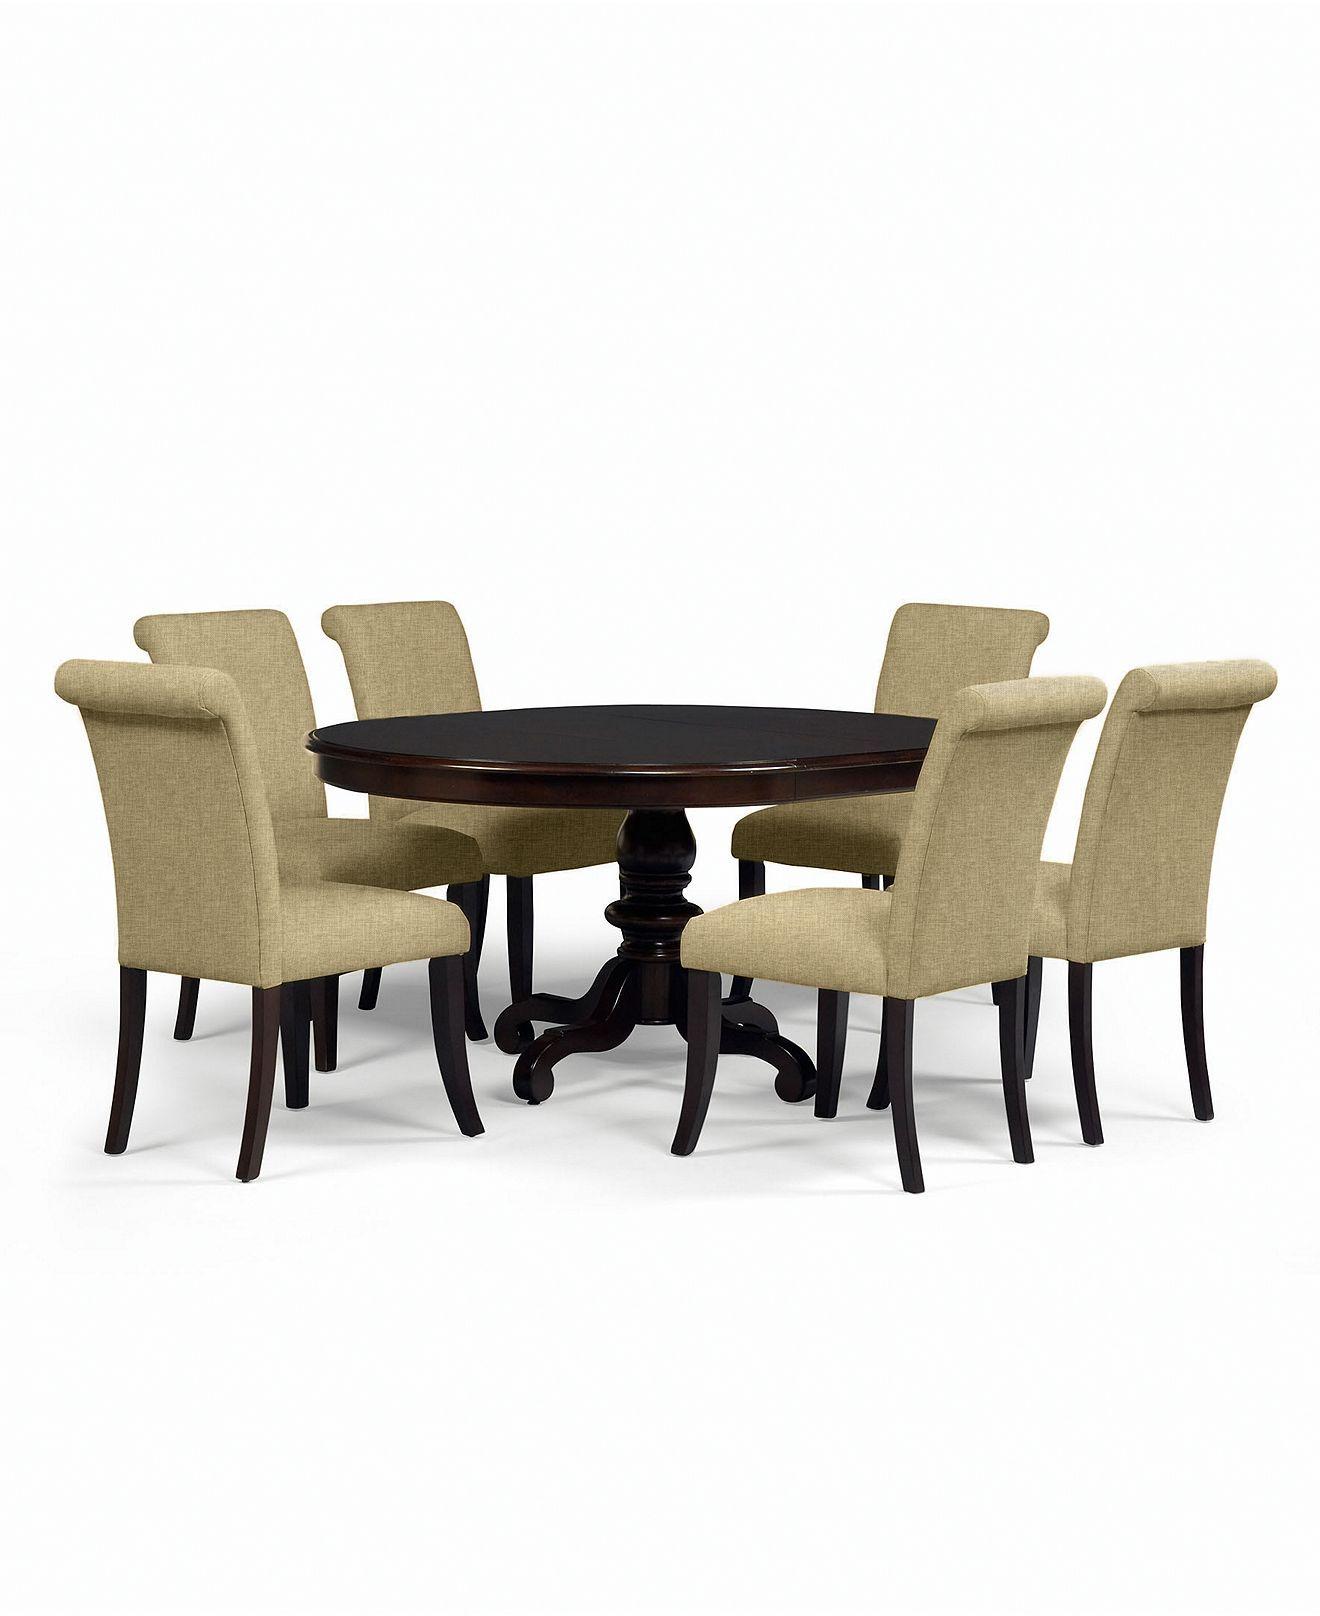 bradford dining room furniture, 7 piece dining set (round table